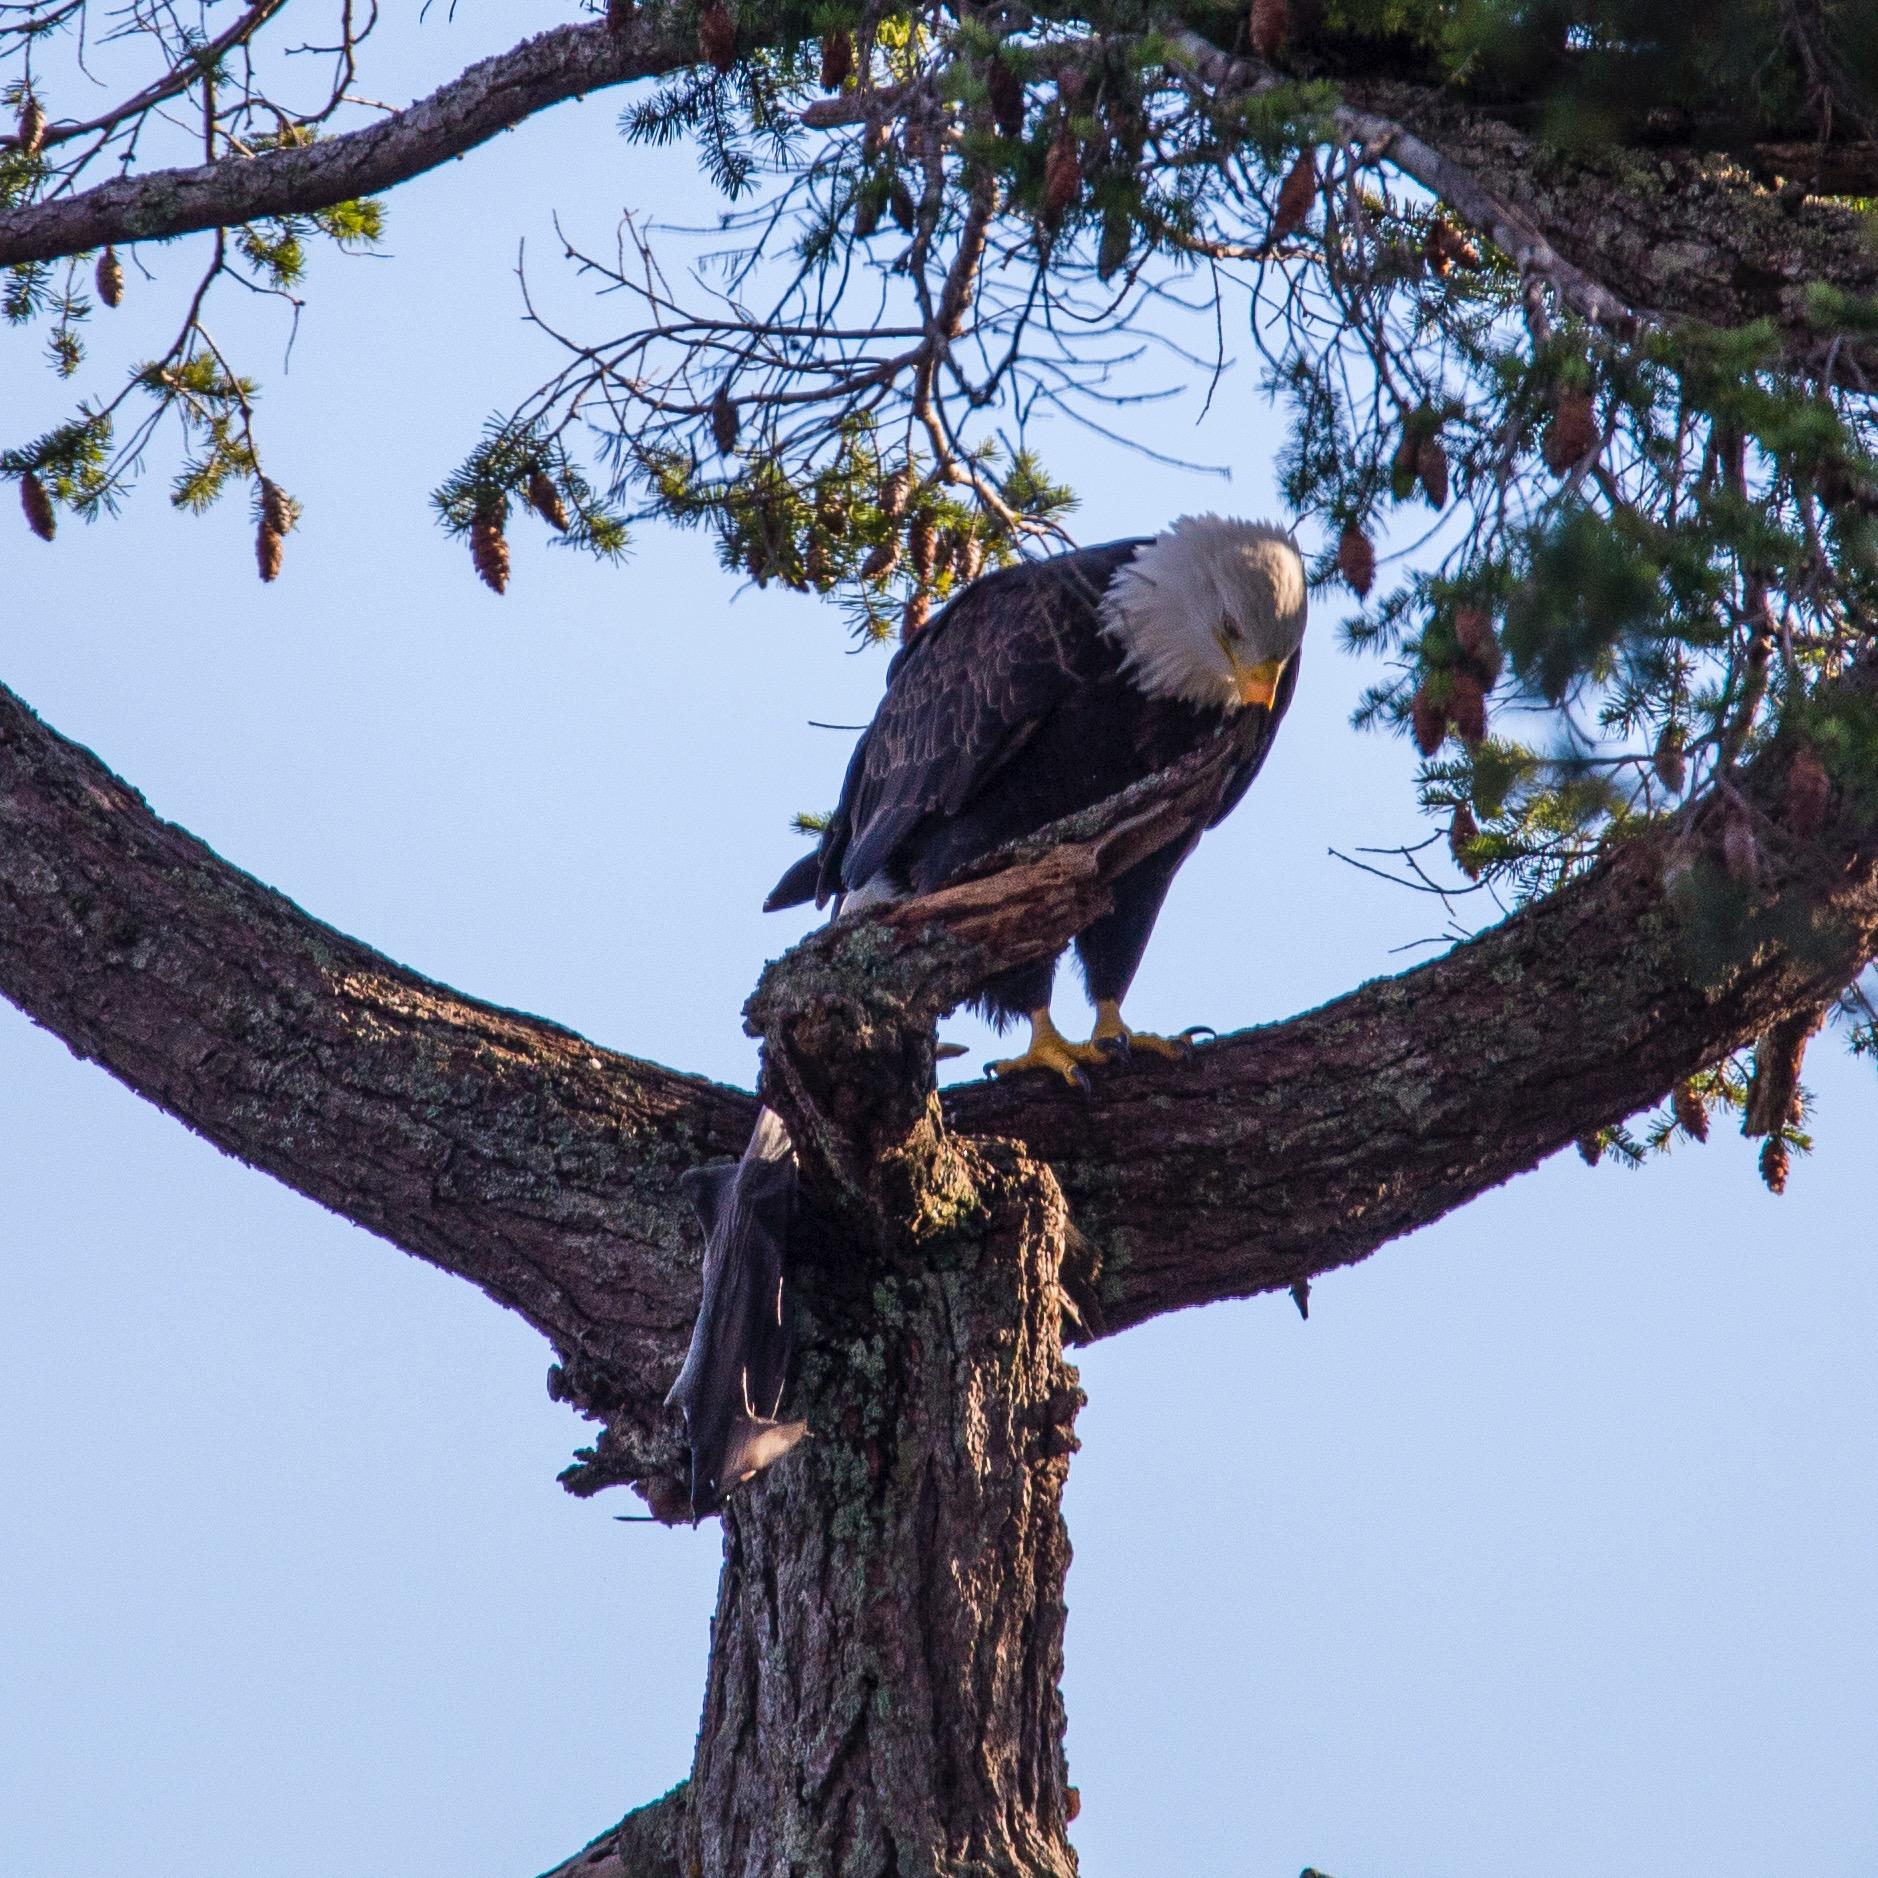 Bald eagle with a fish - a pretty big one!